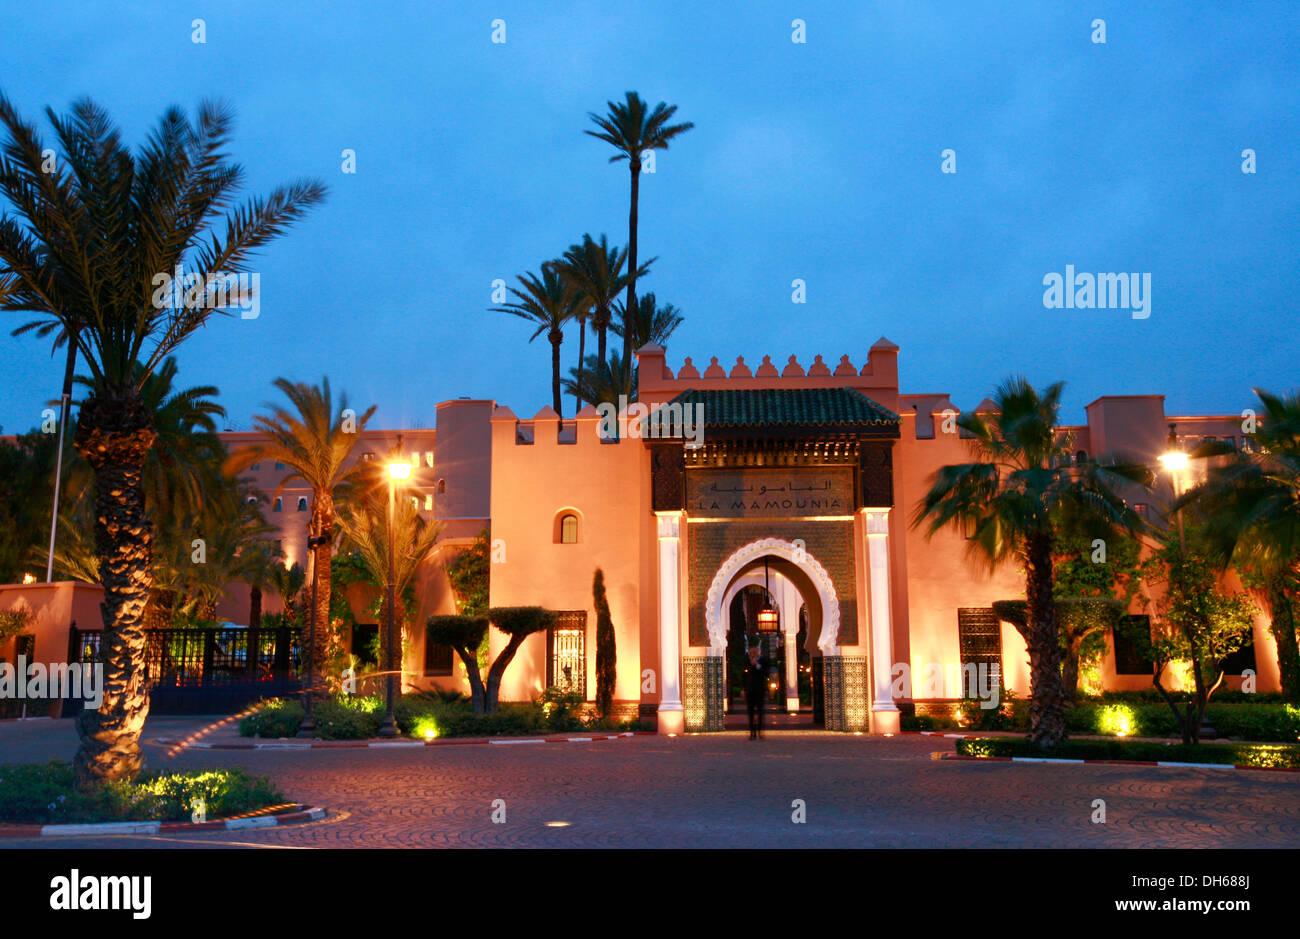 La mamounia luxury hotel marrakech morocco africa